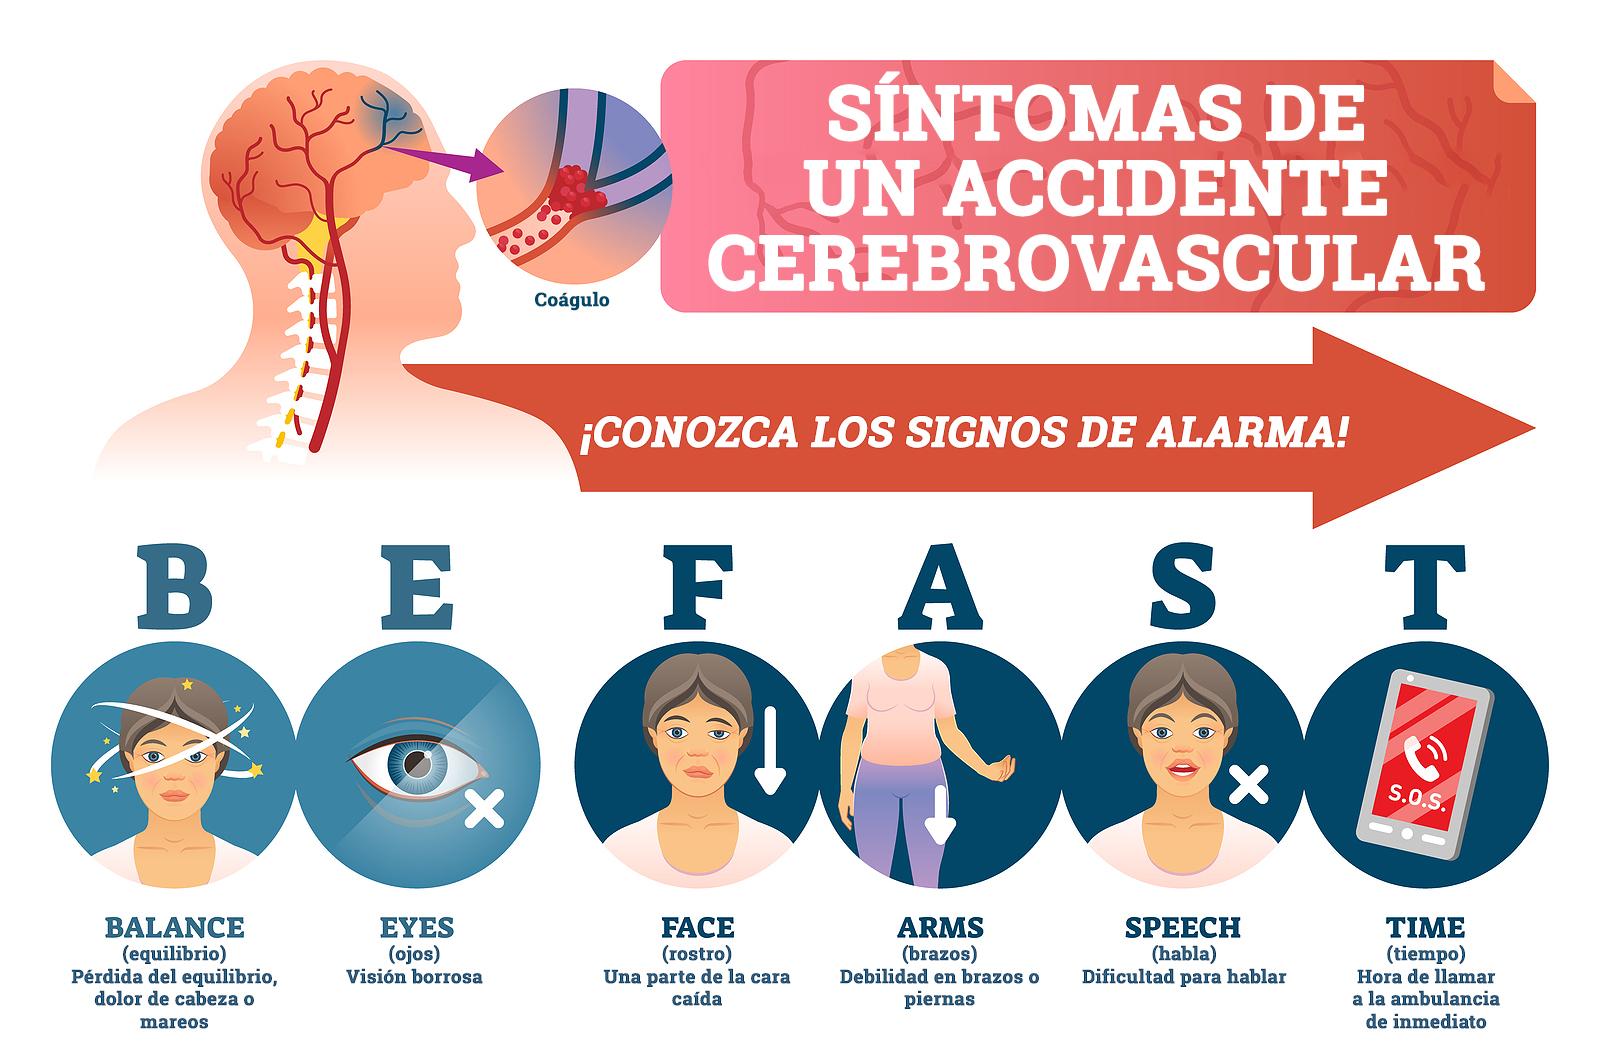 Gráfico de síntomas de un accidente cerebrovascular